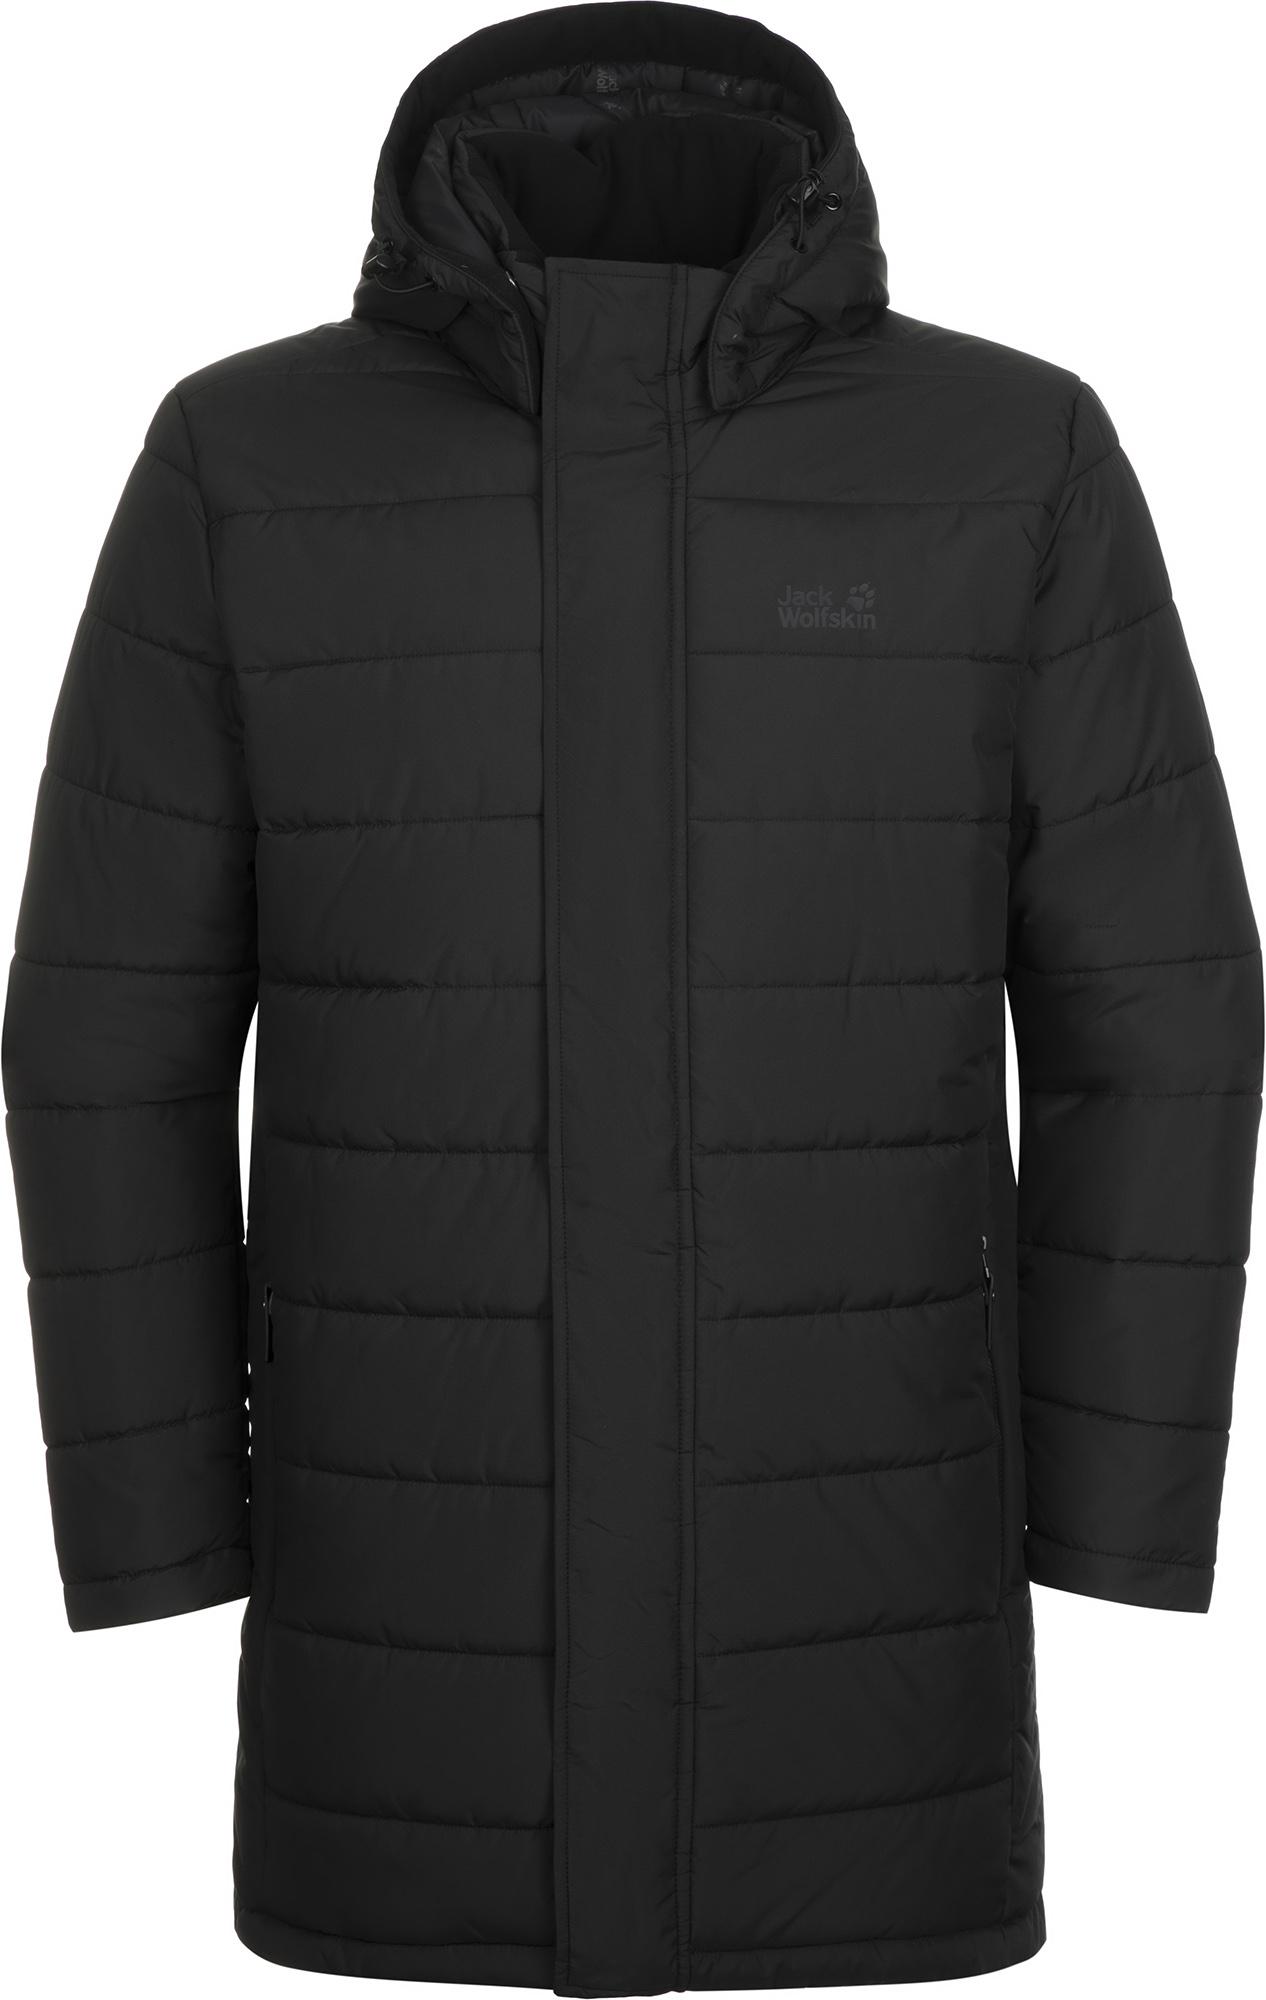 JACK WOLFSKIN Куртка утепленная мужская Jack Wolfskin Svalbard, размер 50-52